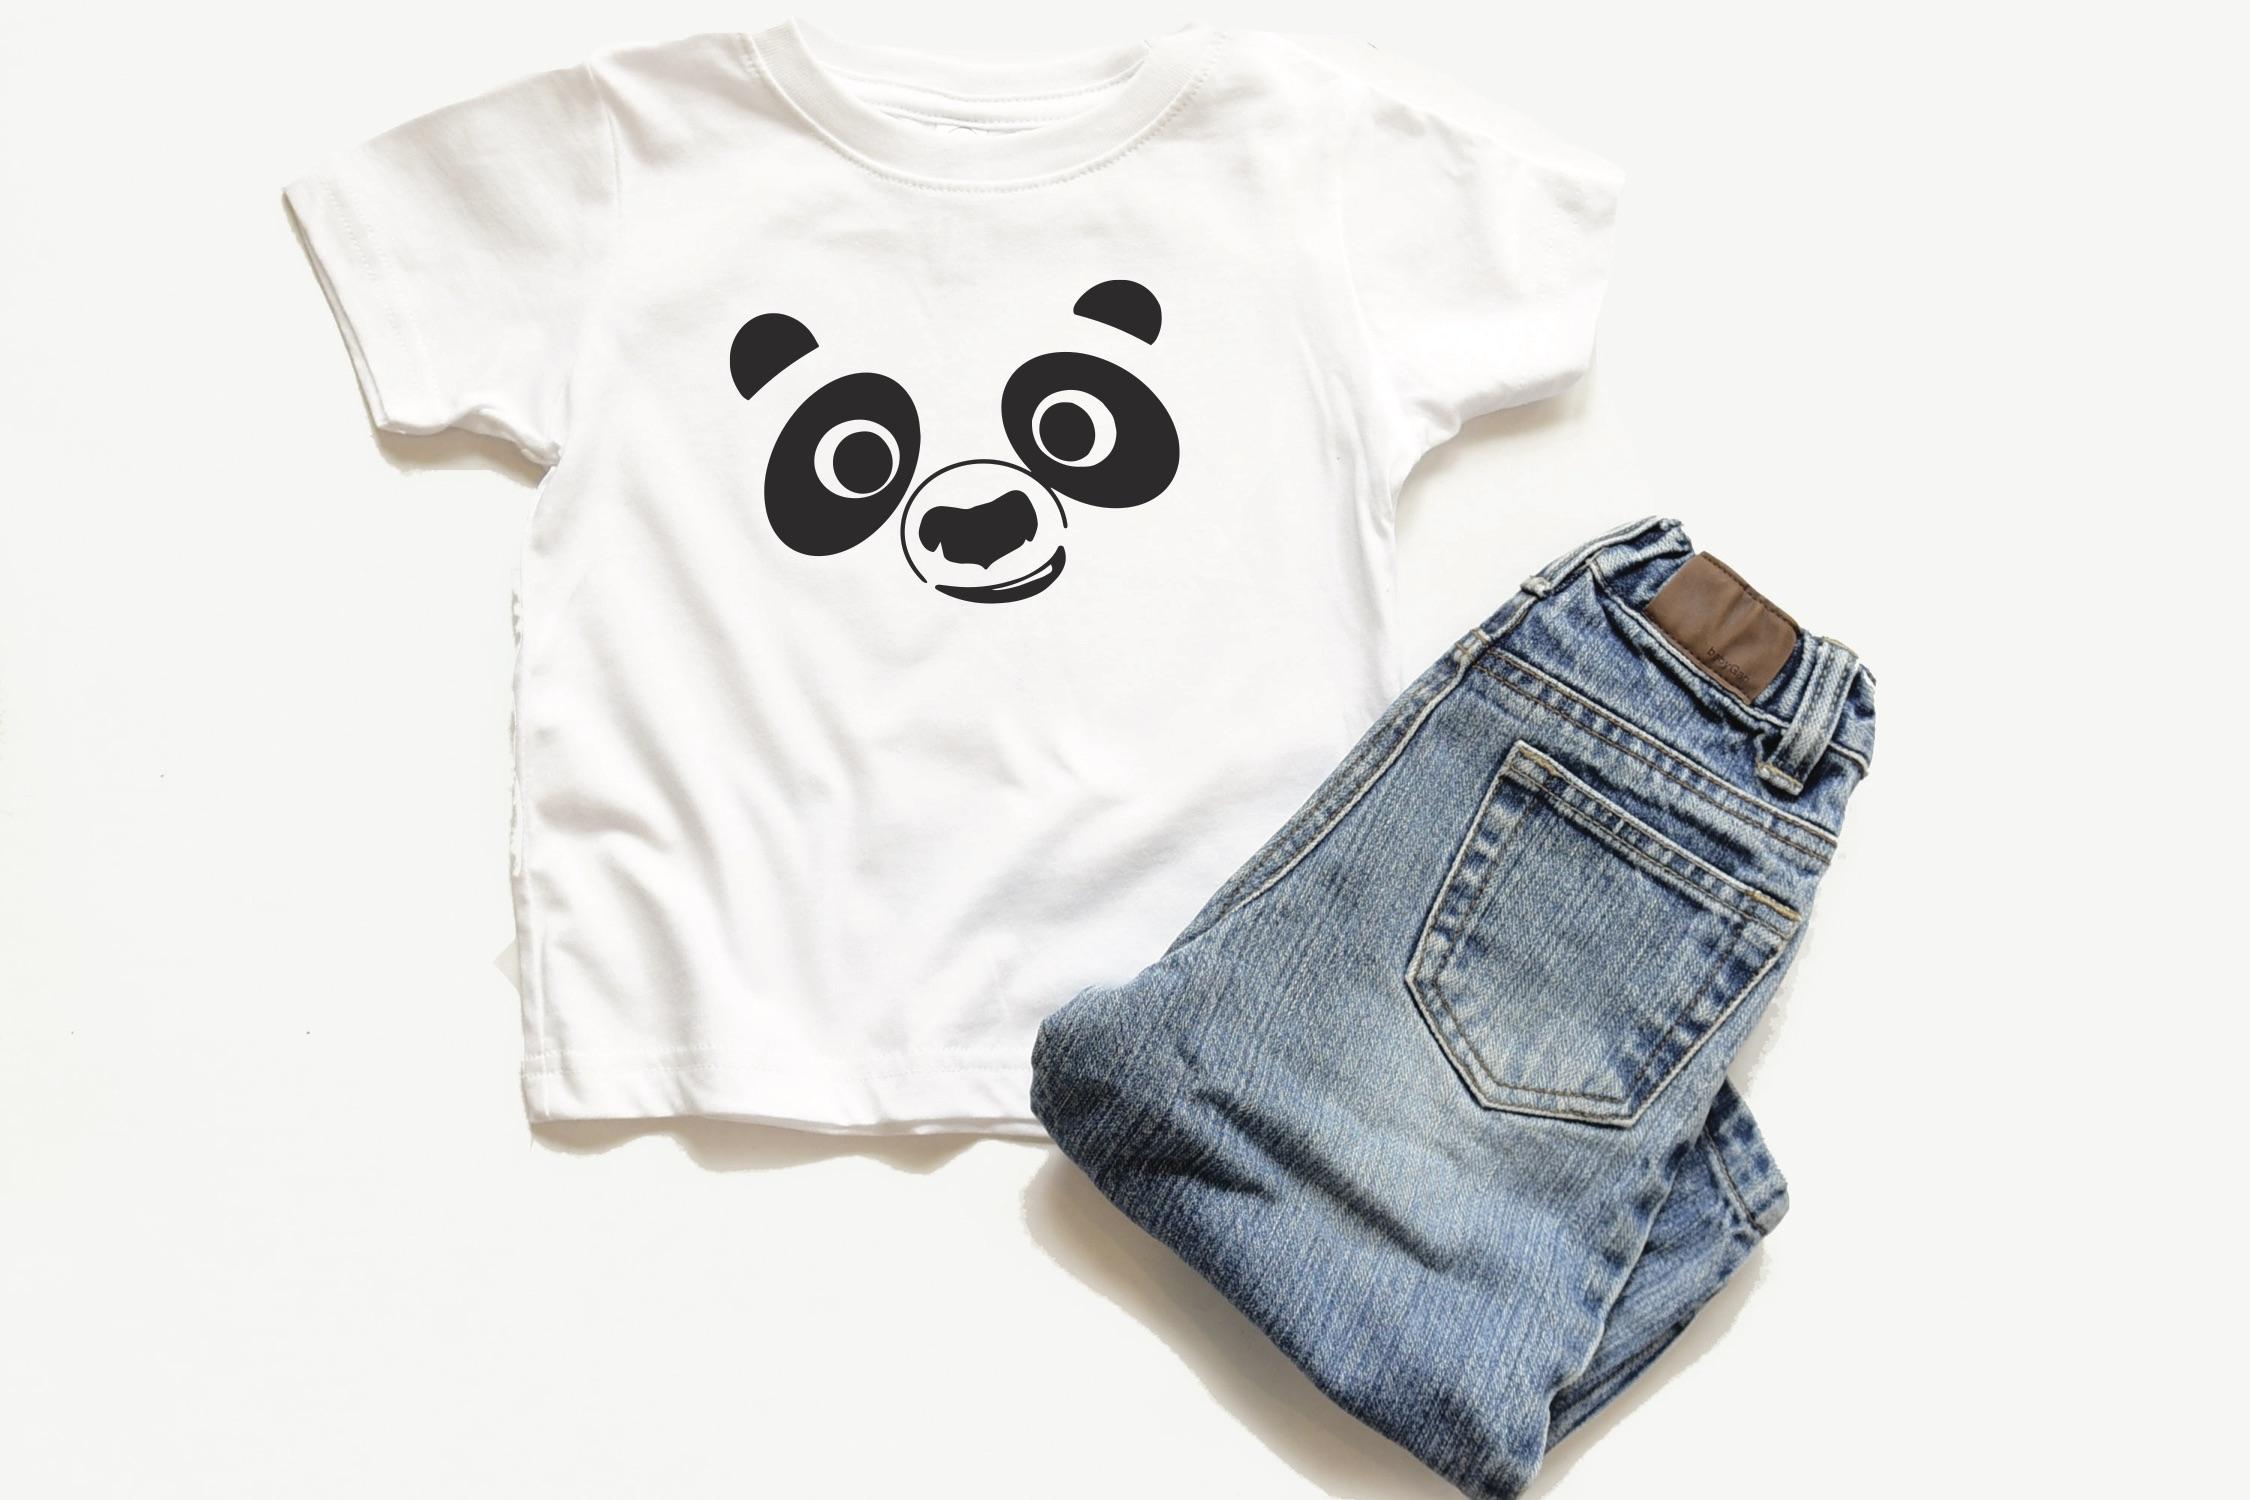 Panda Face Shirt